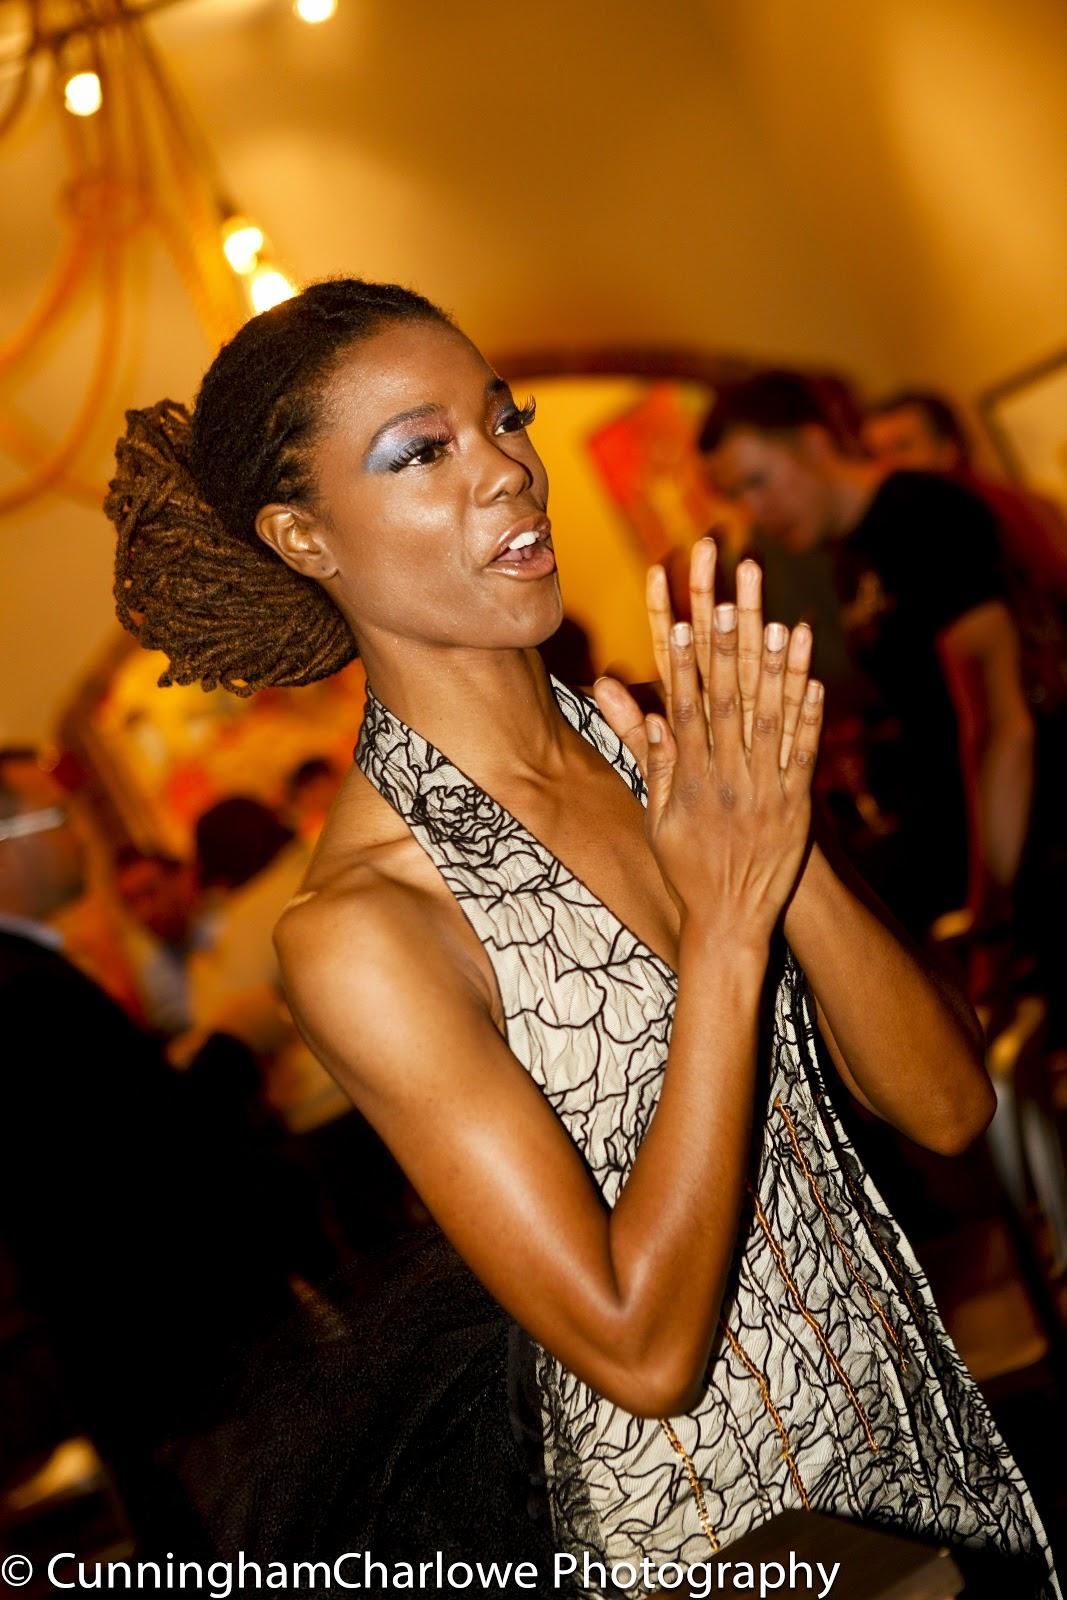 http://2.bp.blogspot.com/-N_kBUMbodjk/UH7JWhdsjaI/AAAAAAAADpE/mo7DLDvpGWQ/s1600/SC1333+-+CMH+Fashion+Week+-+Thomas+McClure+-+Camelot+Cellar+-+Event+Photography+-+Nicole+-+10-15-12+-0049.jpg